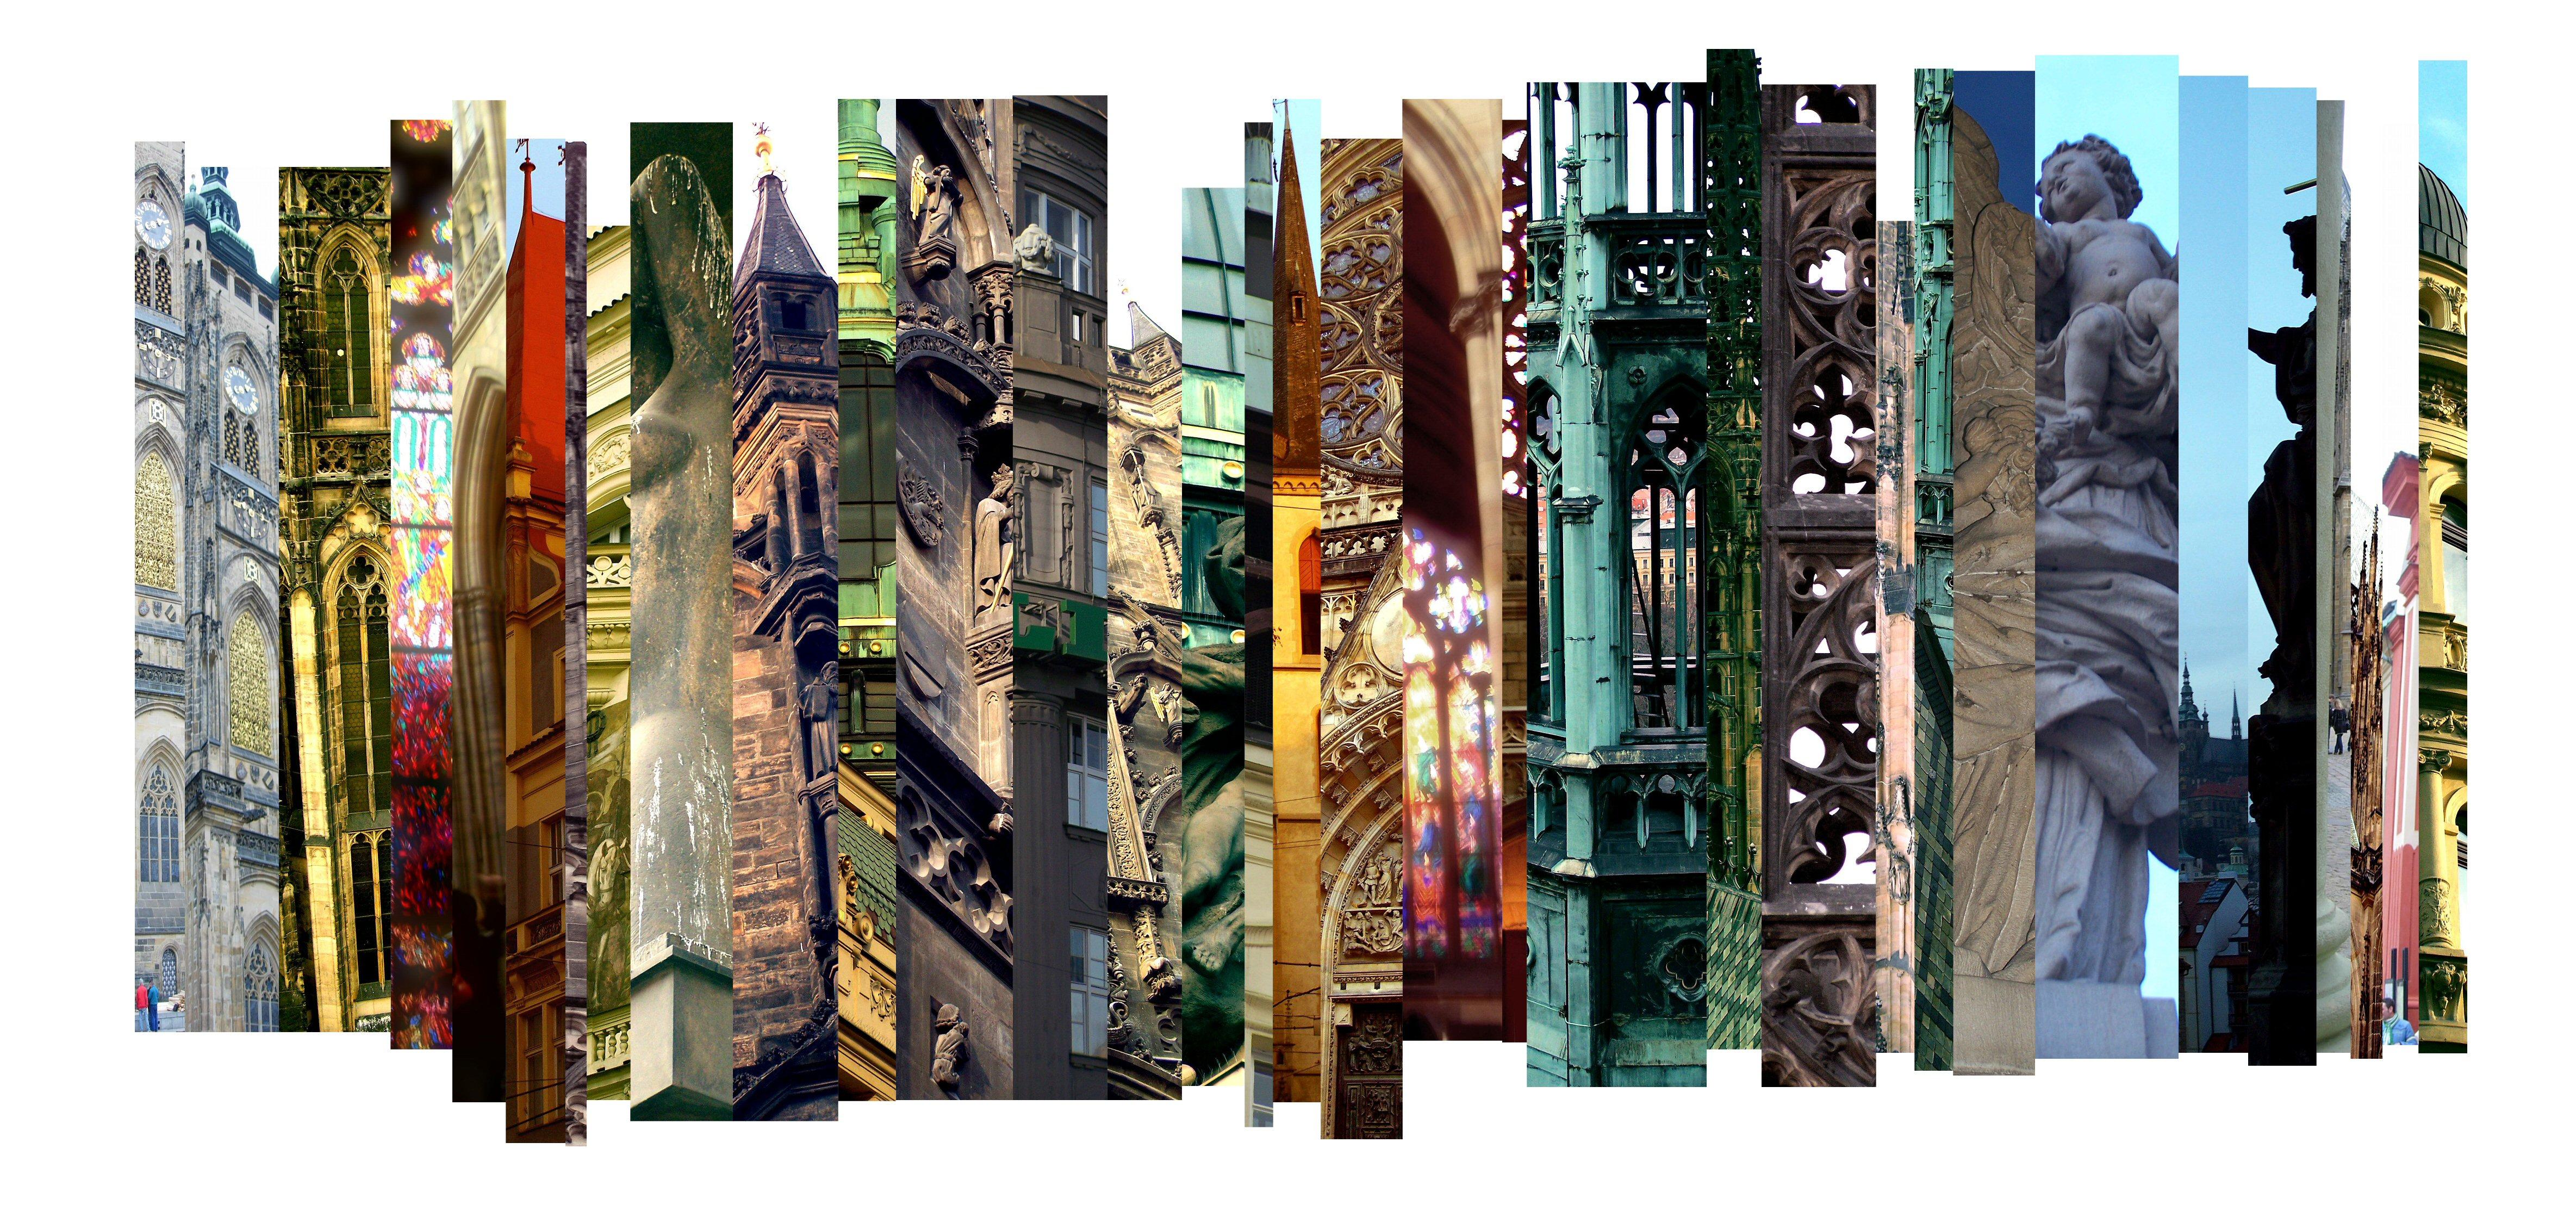 Segmented Prague